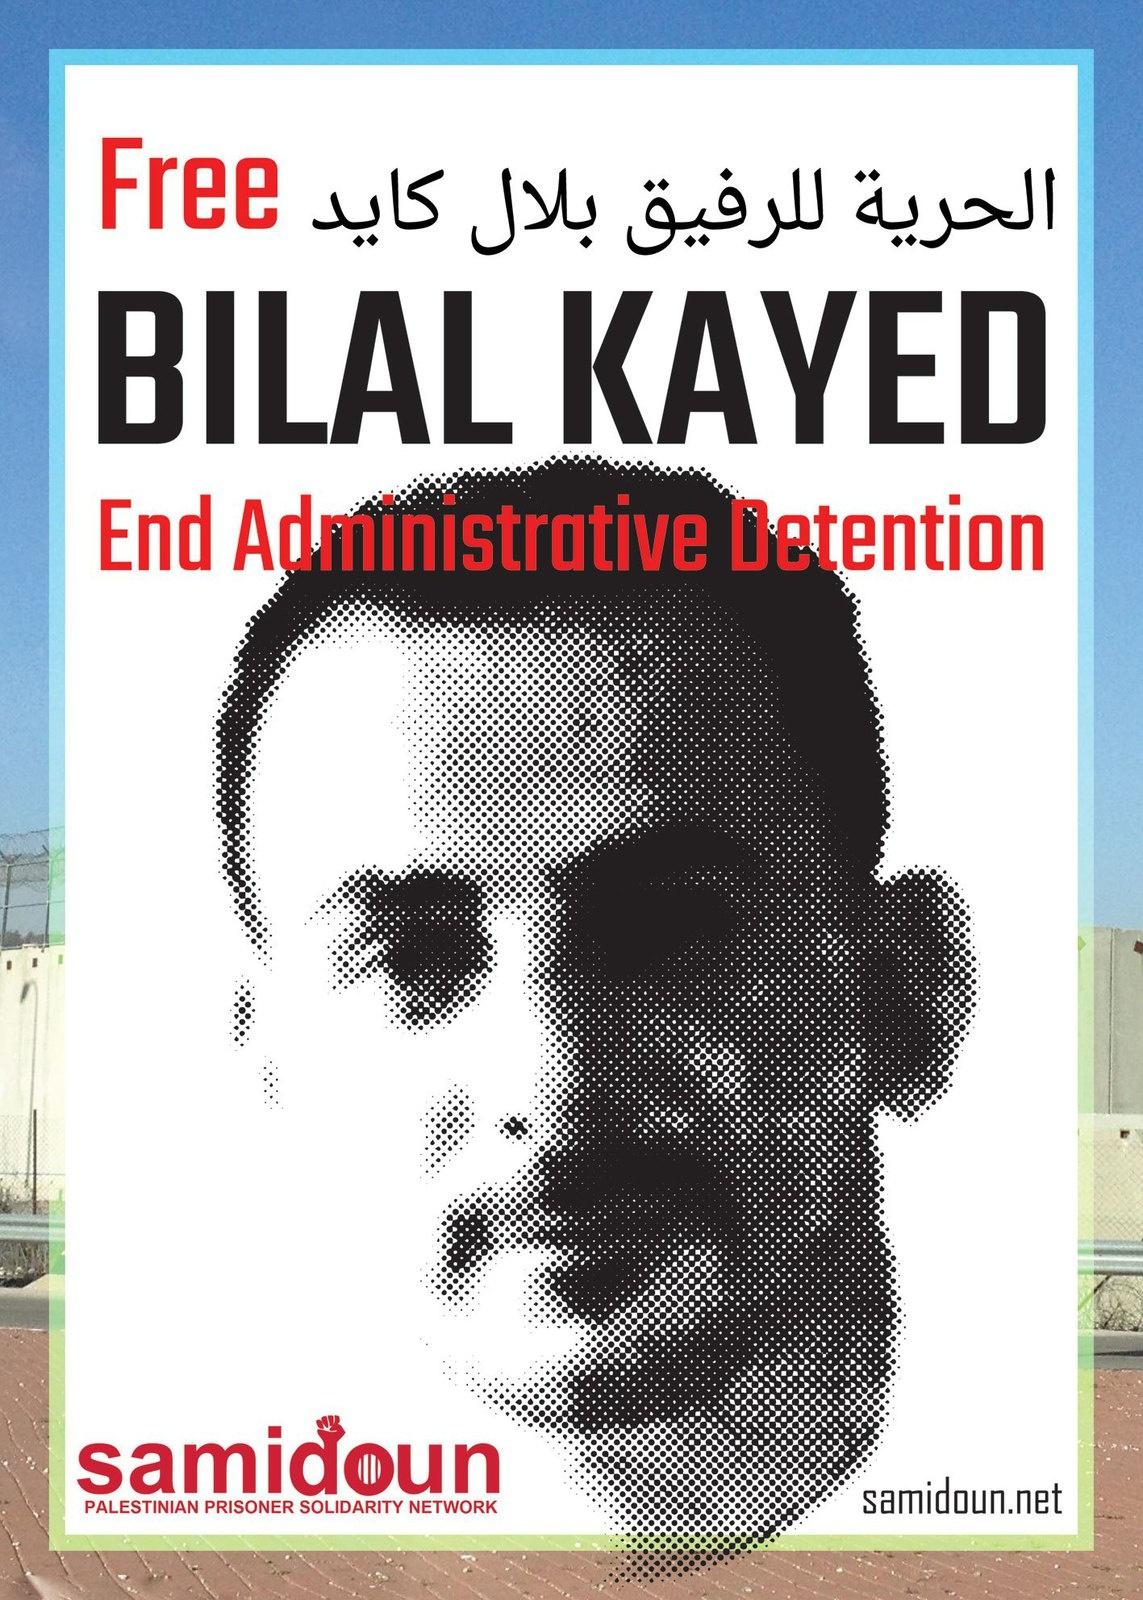 Liberté pour Bilal Kayed